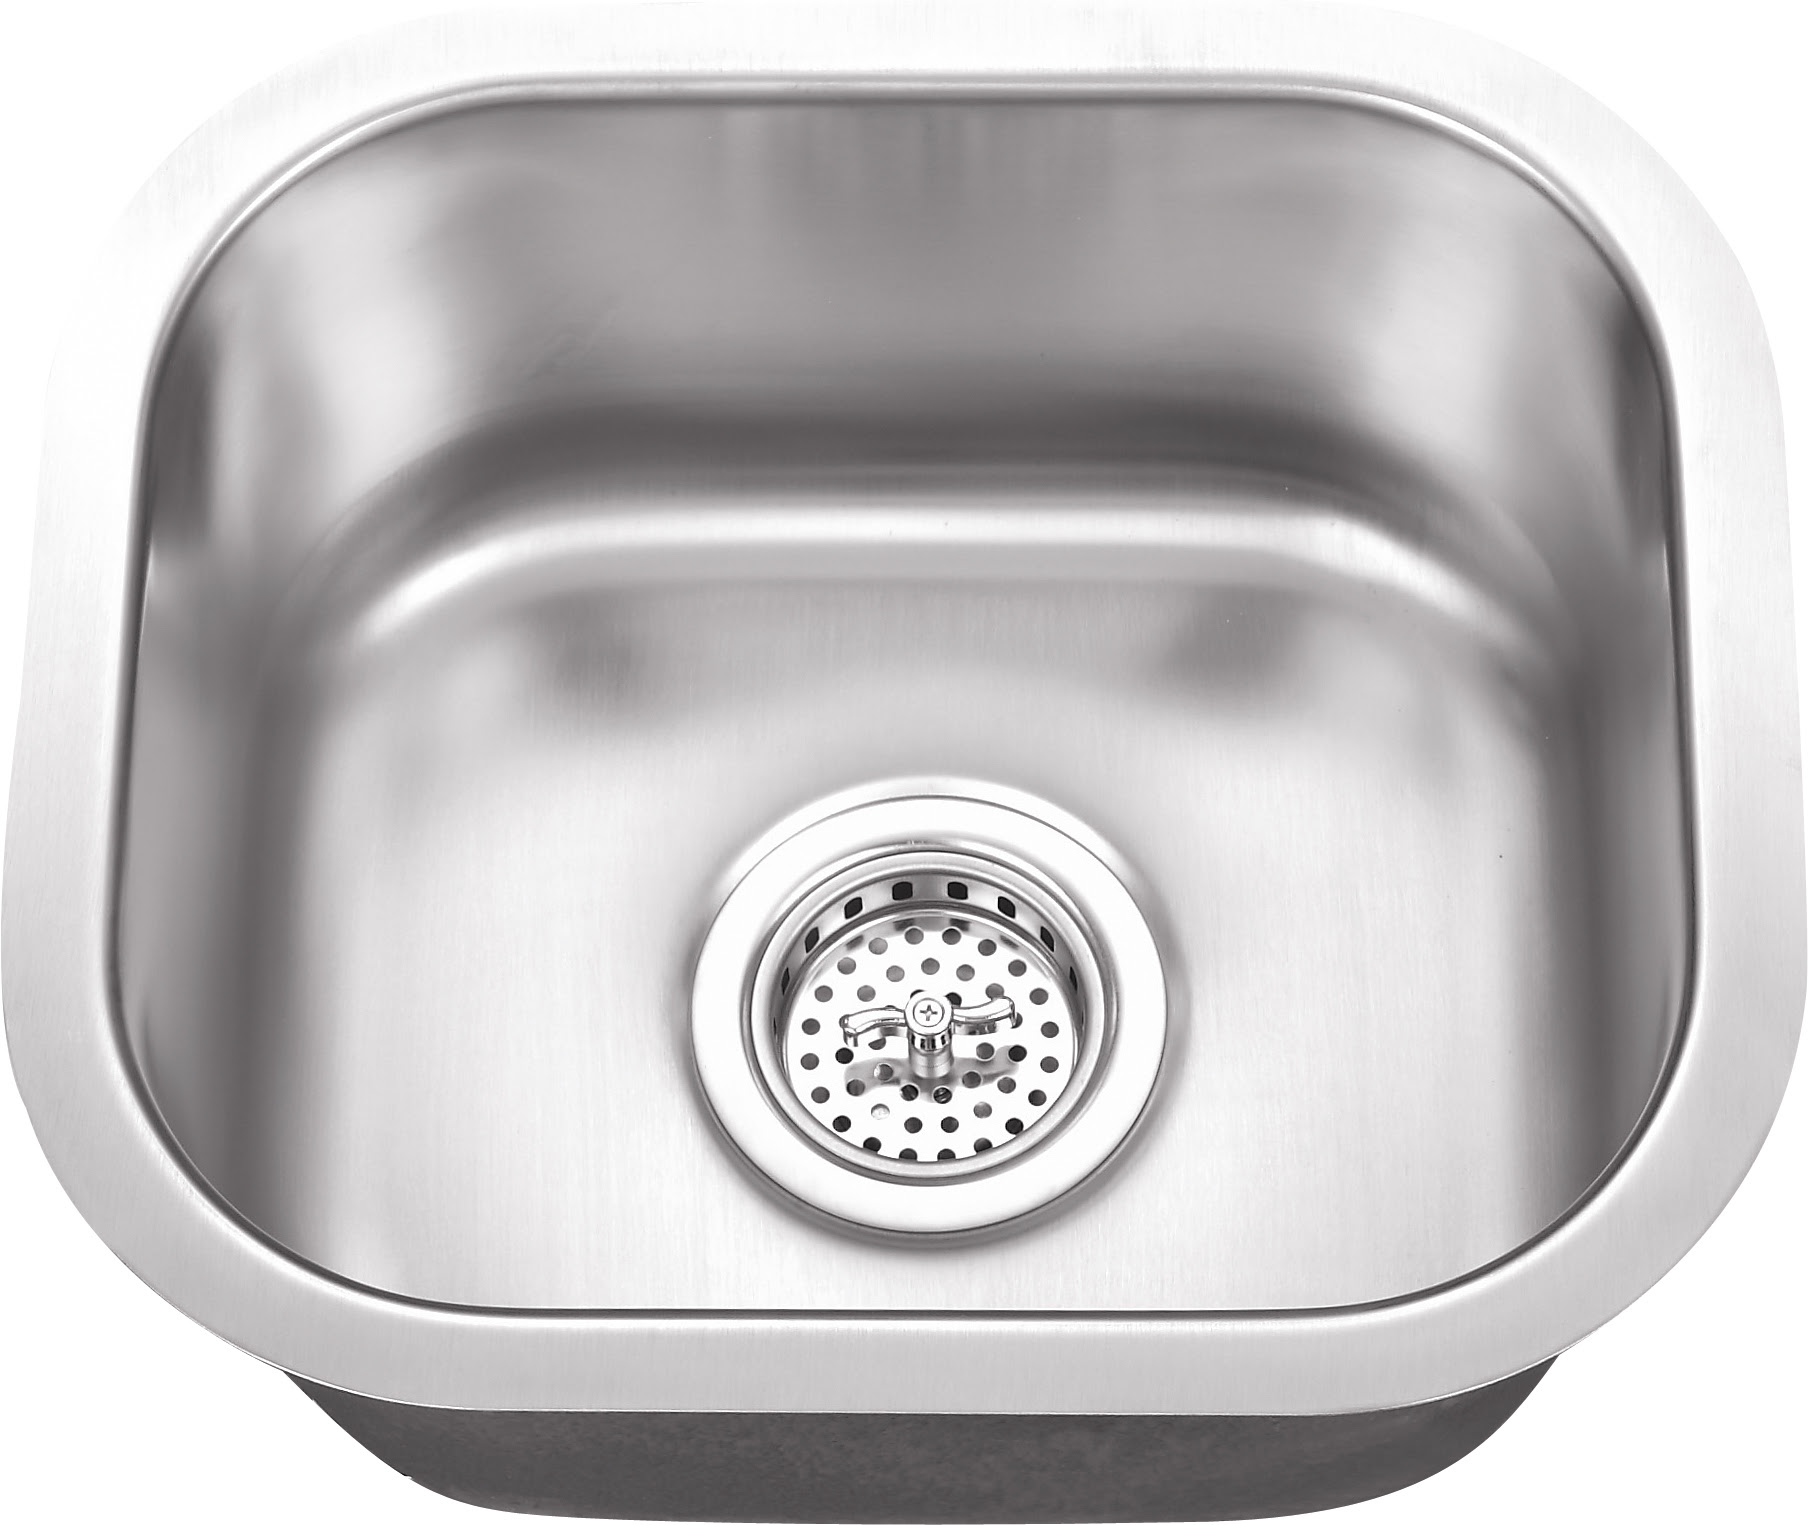 Sinks Faucets Pittsburgh Kitchenramma Llc